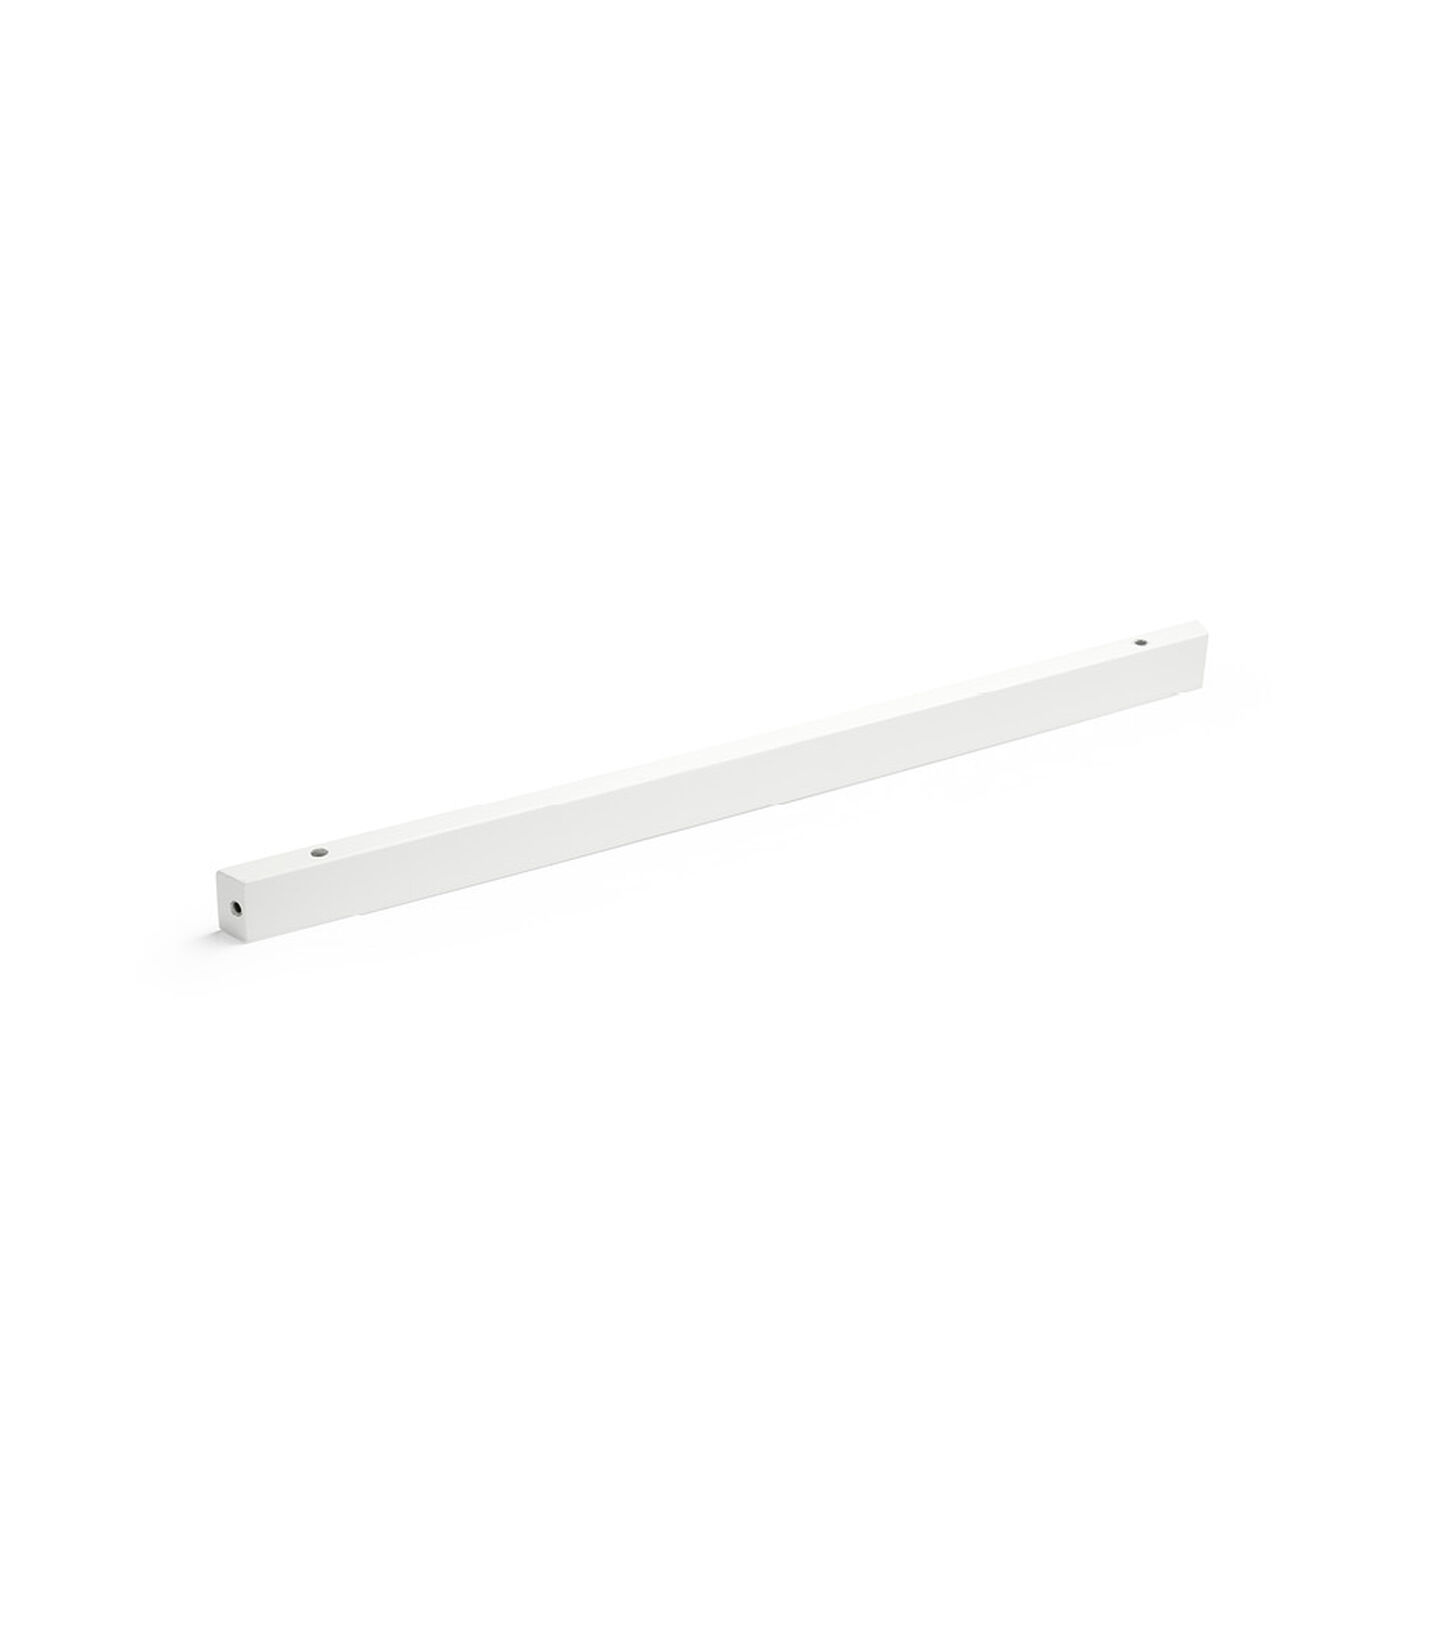 Stokke® Care™ Spare part. 164904 Care 09 Shelf lower strech White.